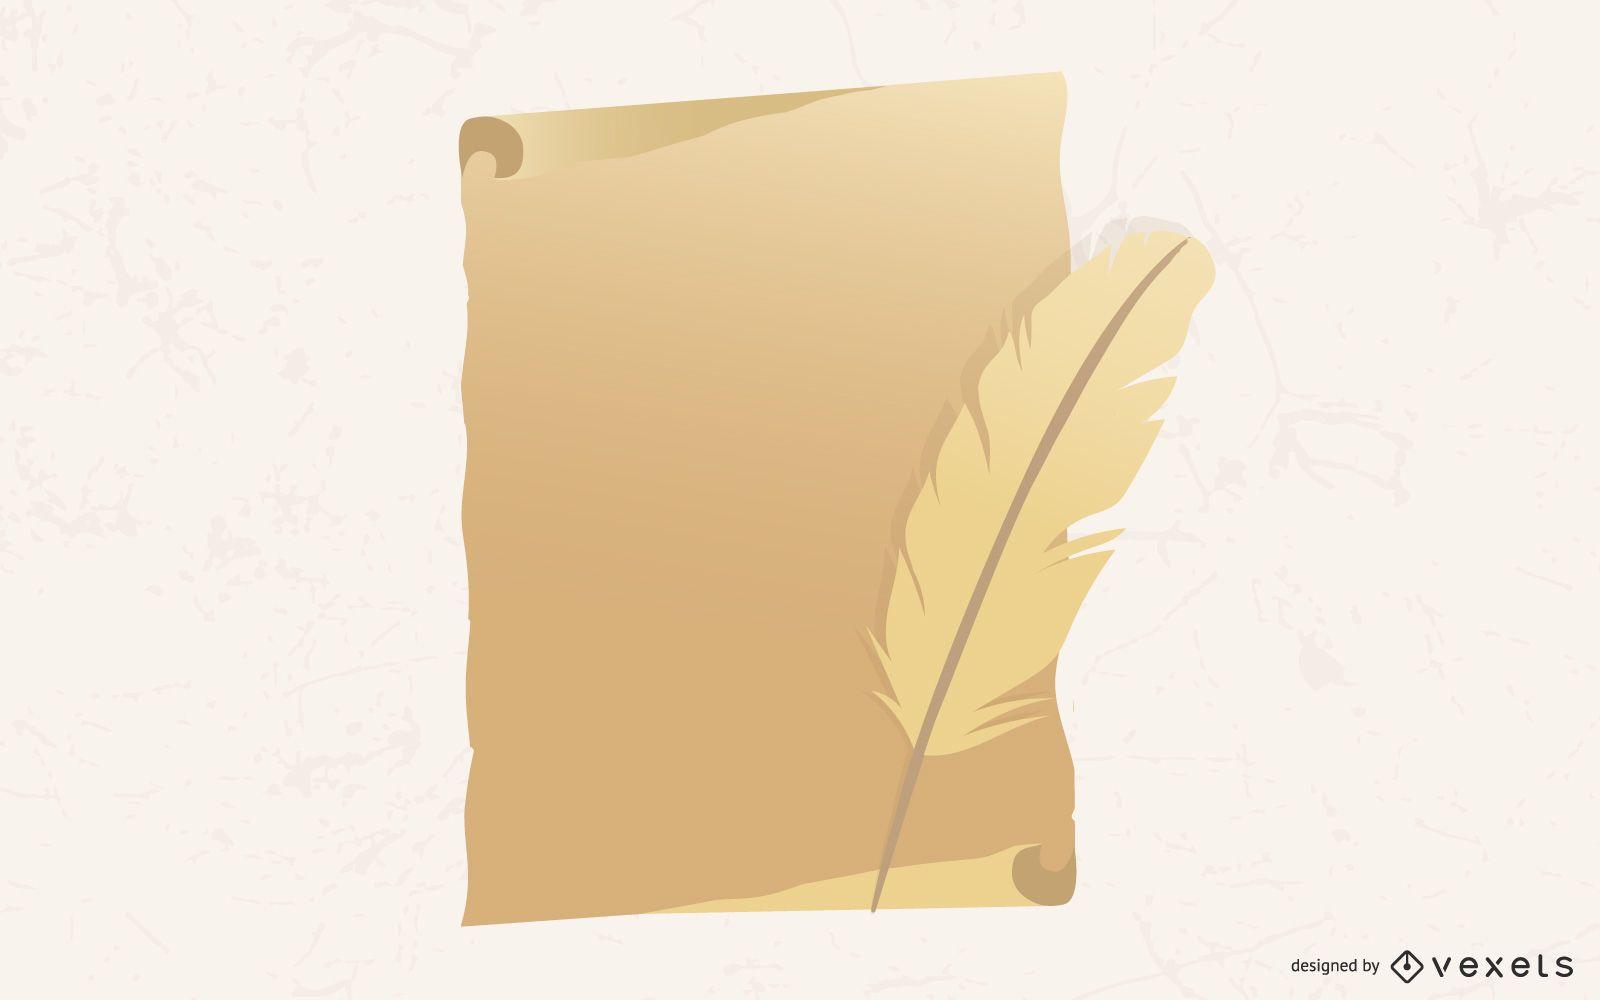 Papel viejo con pluma